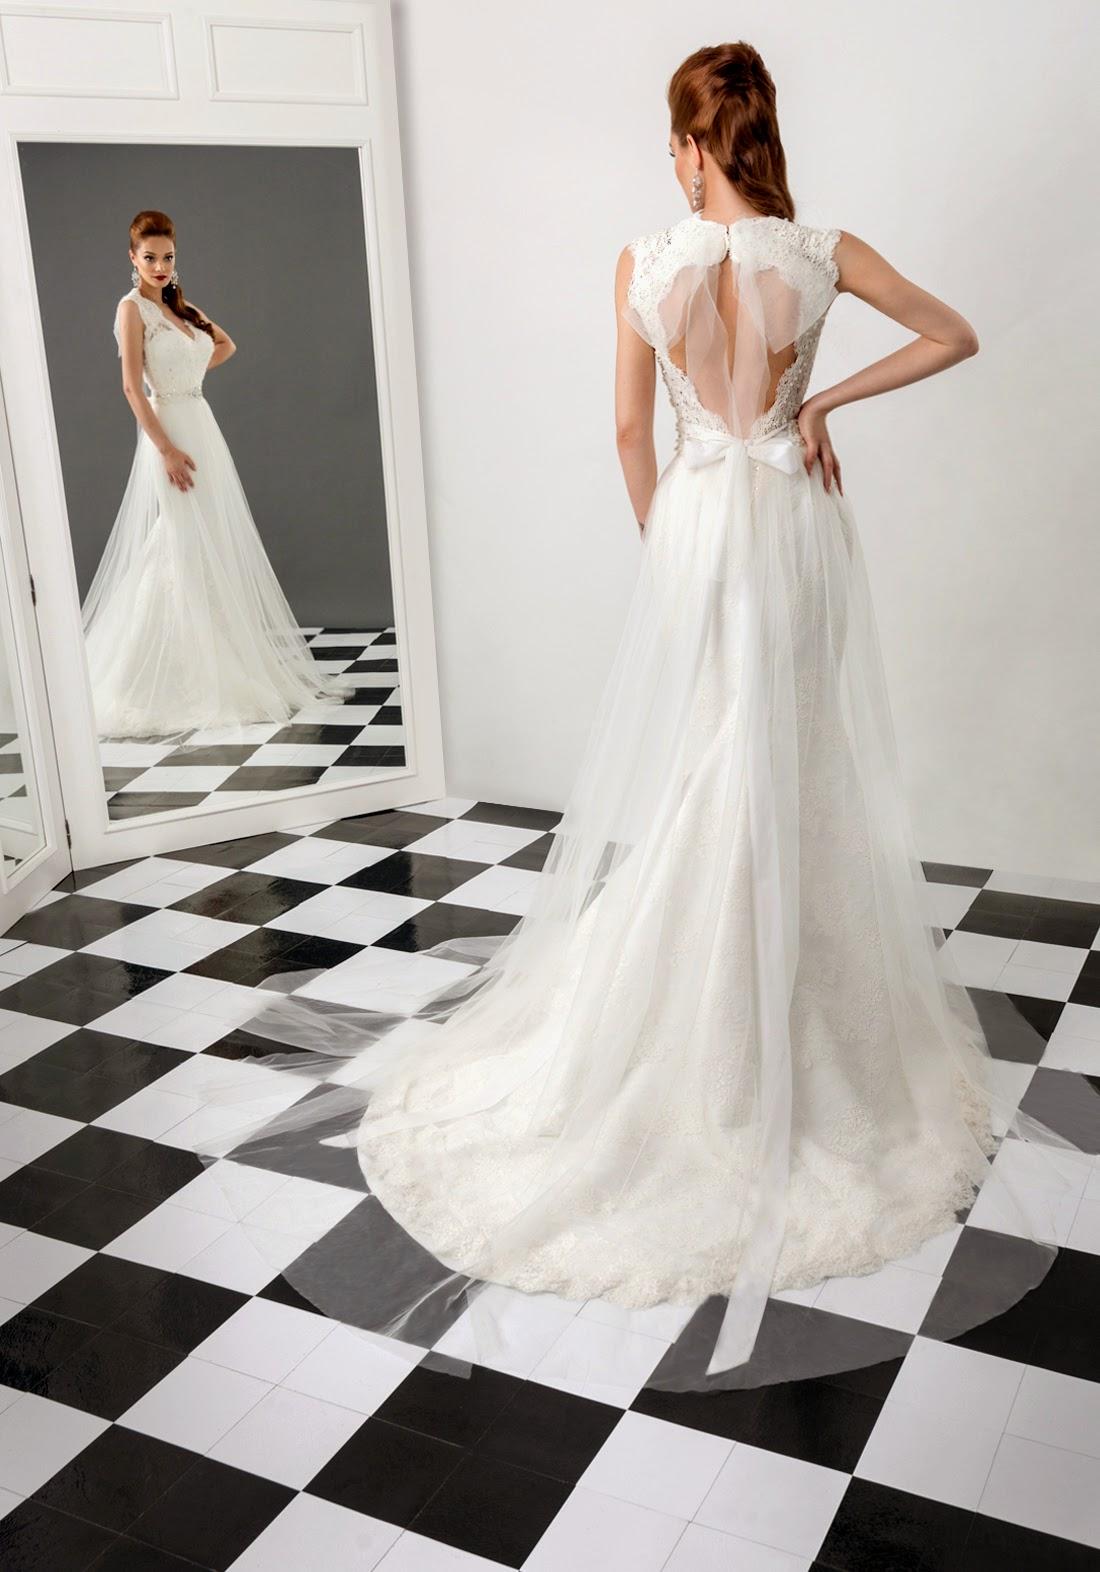 2015 Wedding Dresses by BIEN SAVVY